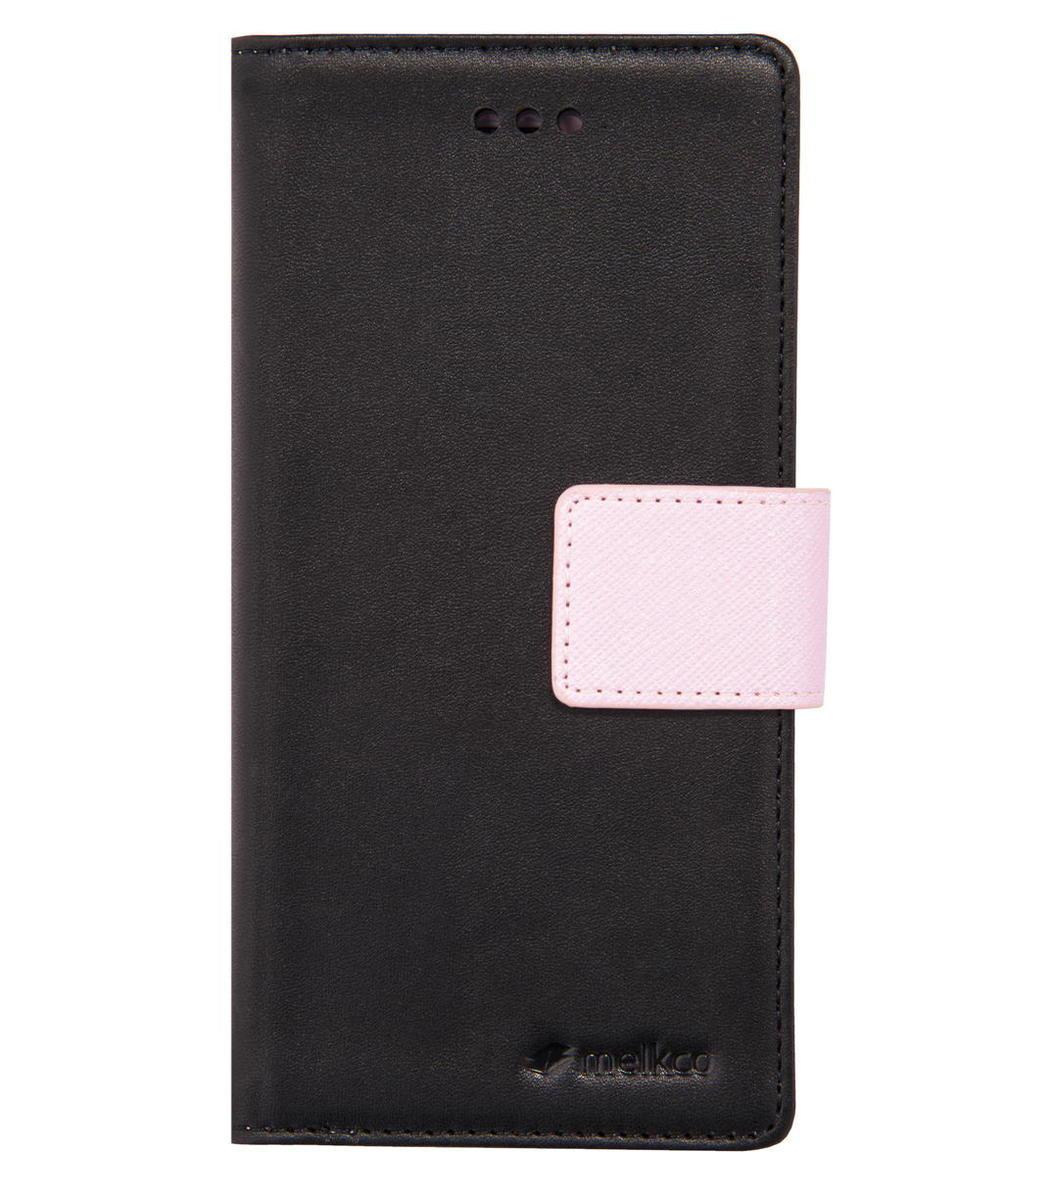 "iPhone 6 Plus/6S Plus 5.5"" Pure 系列 人造皮手機套 - 黑色/粉紅色"